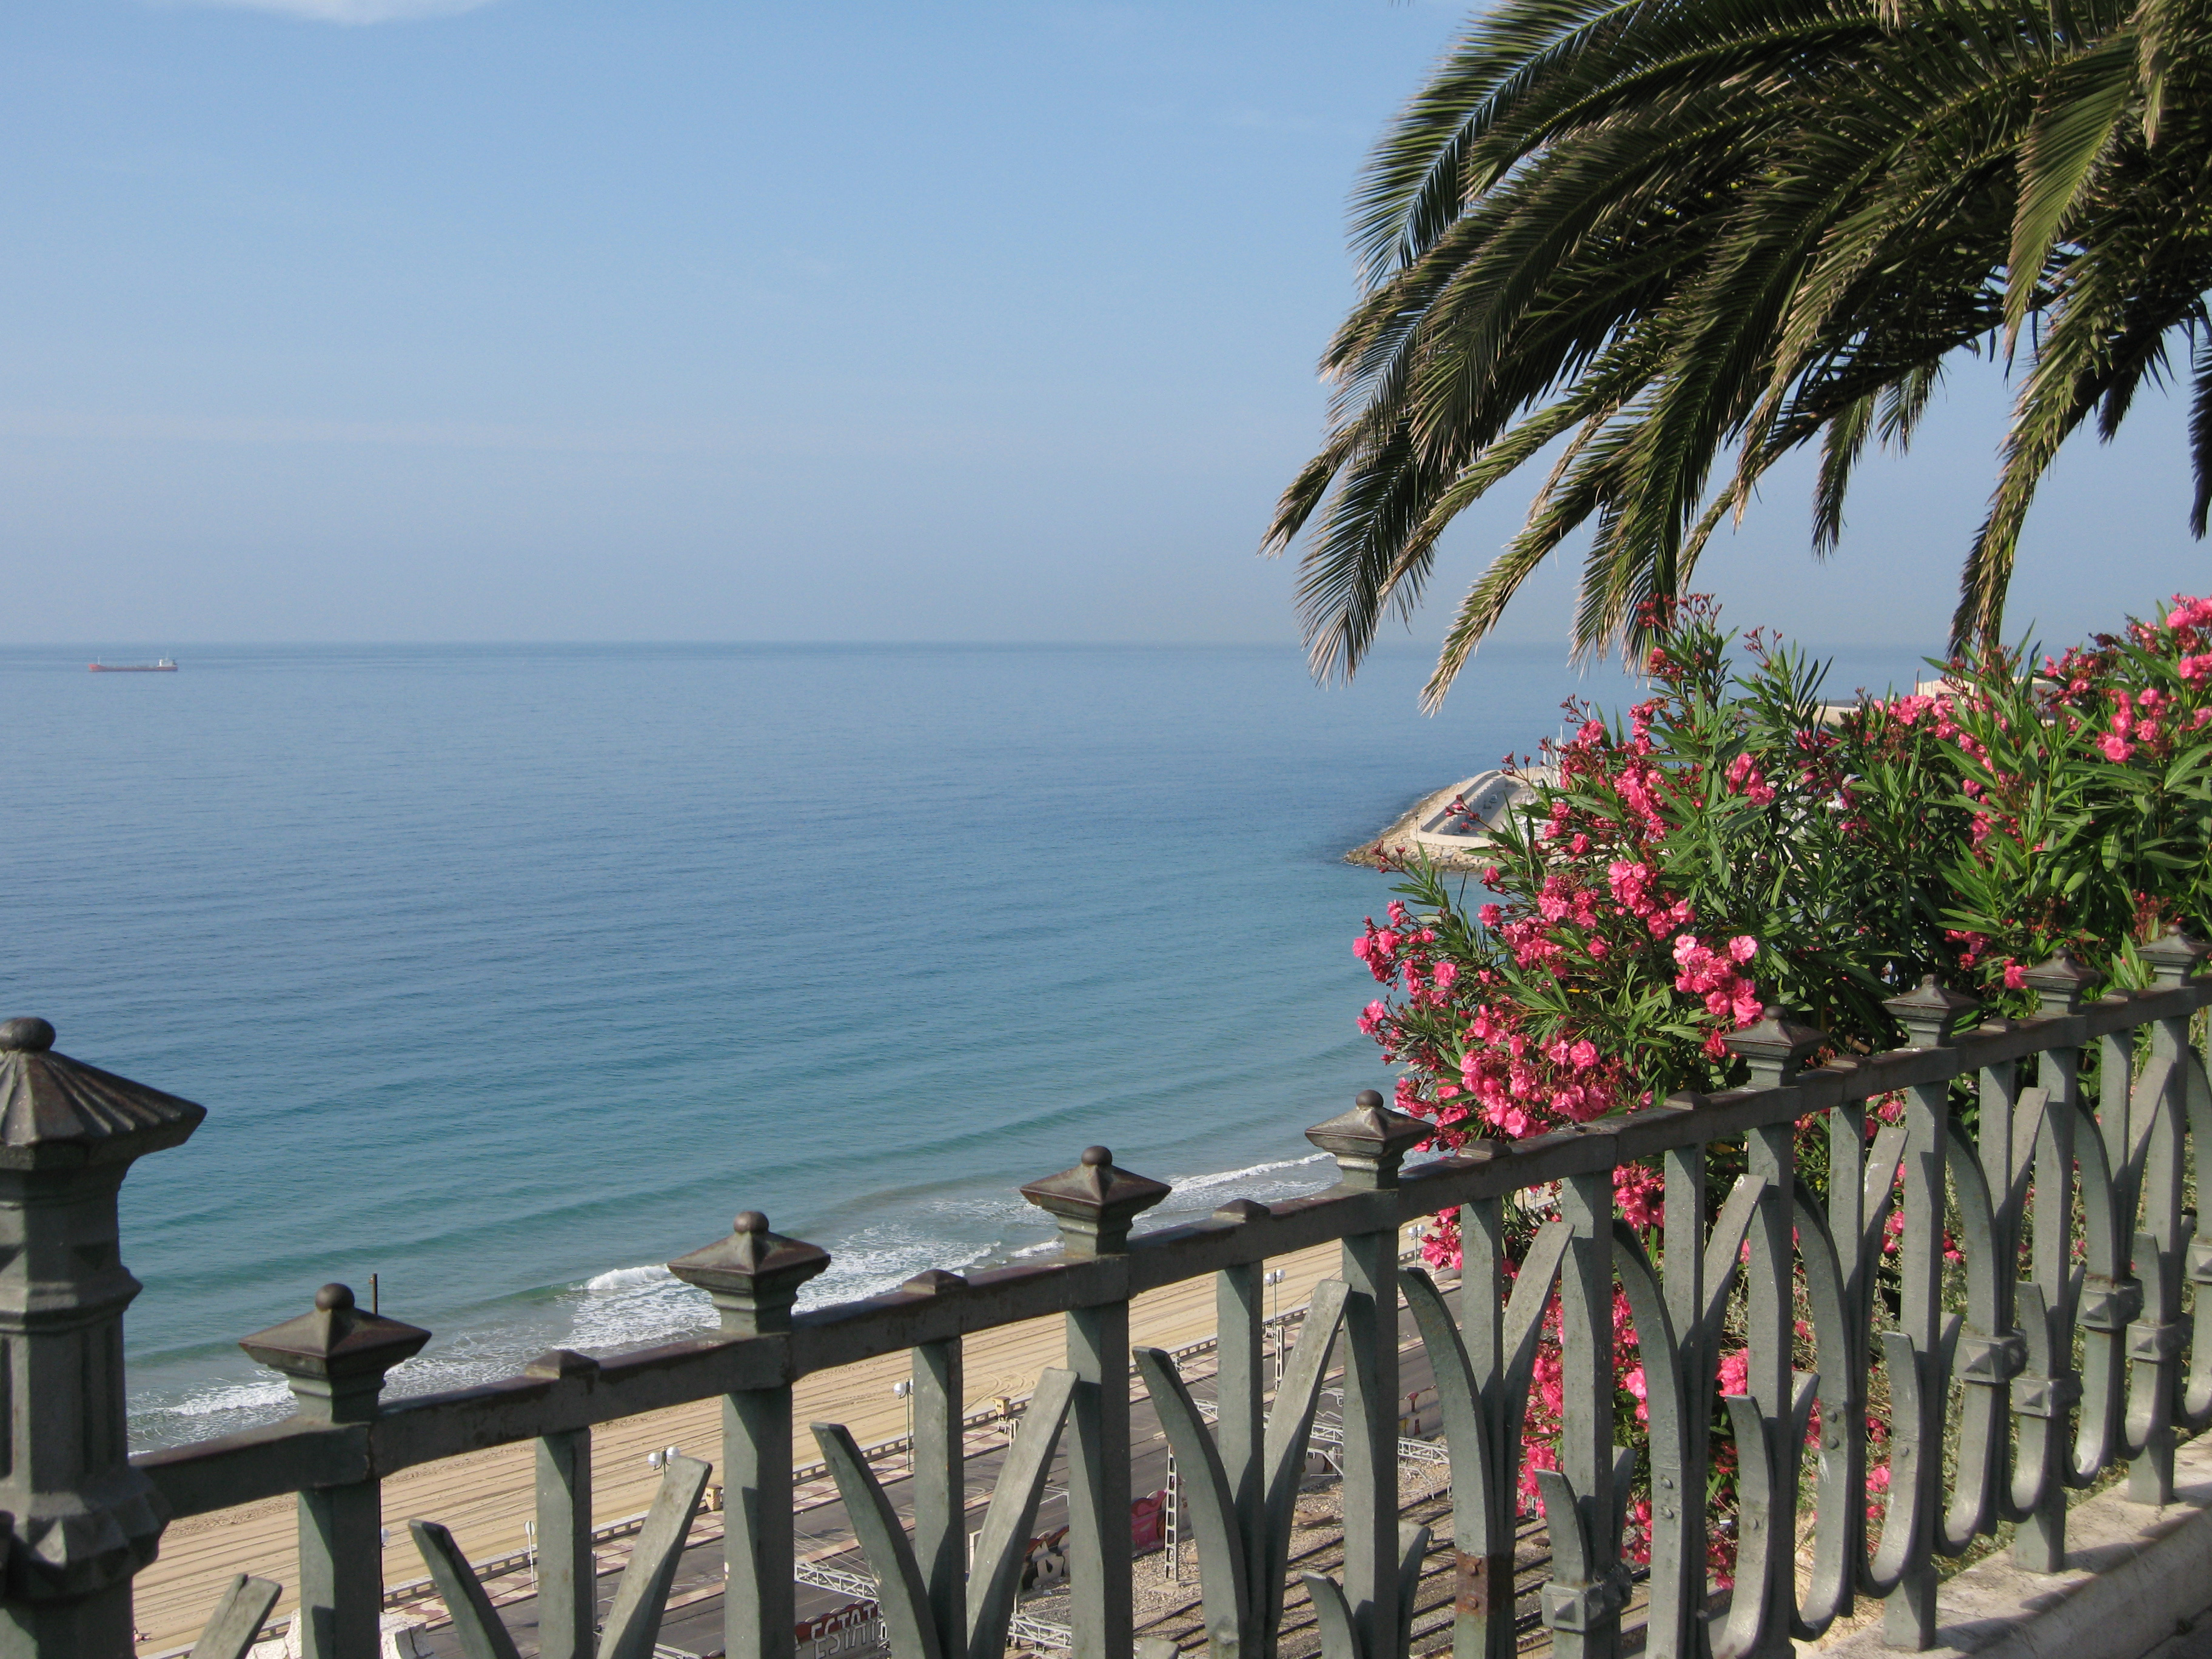 Tarragona Spain  city pictures gallery : Tarragona Spain Balcon sea view Wikimedia Commons